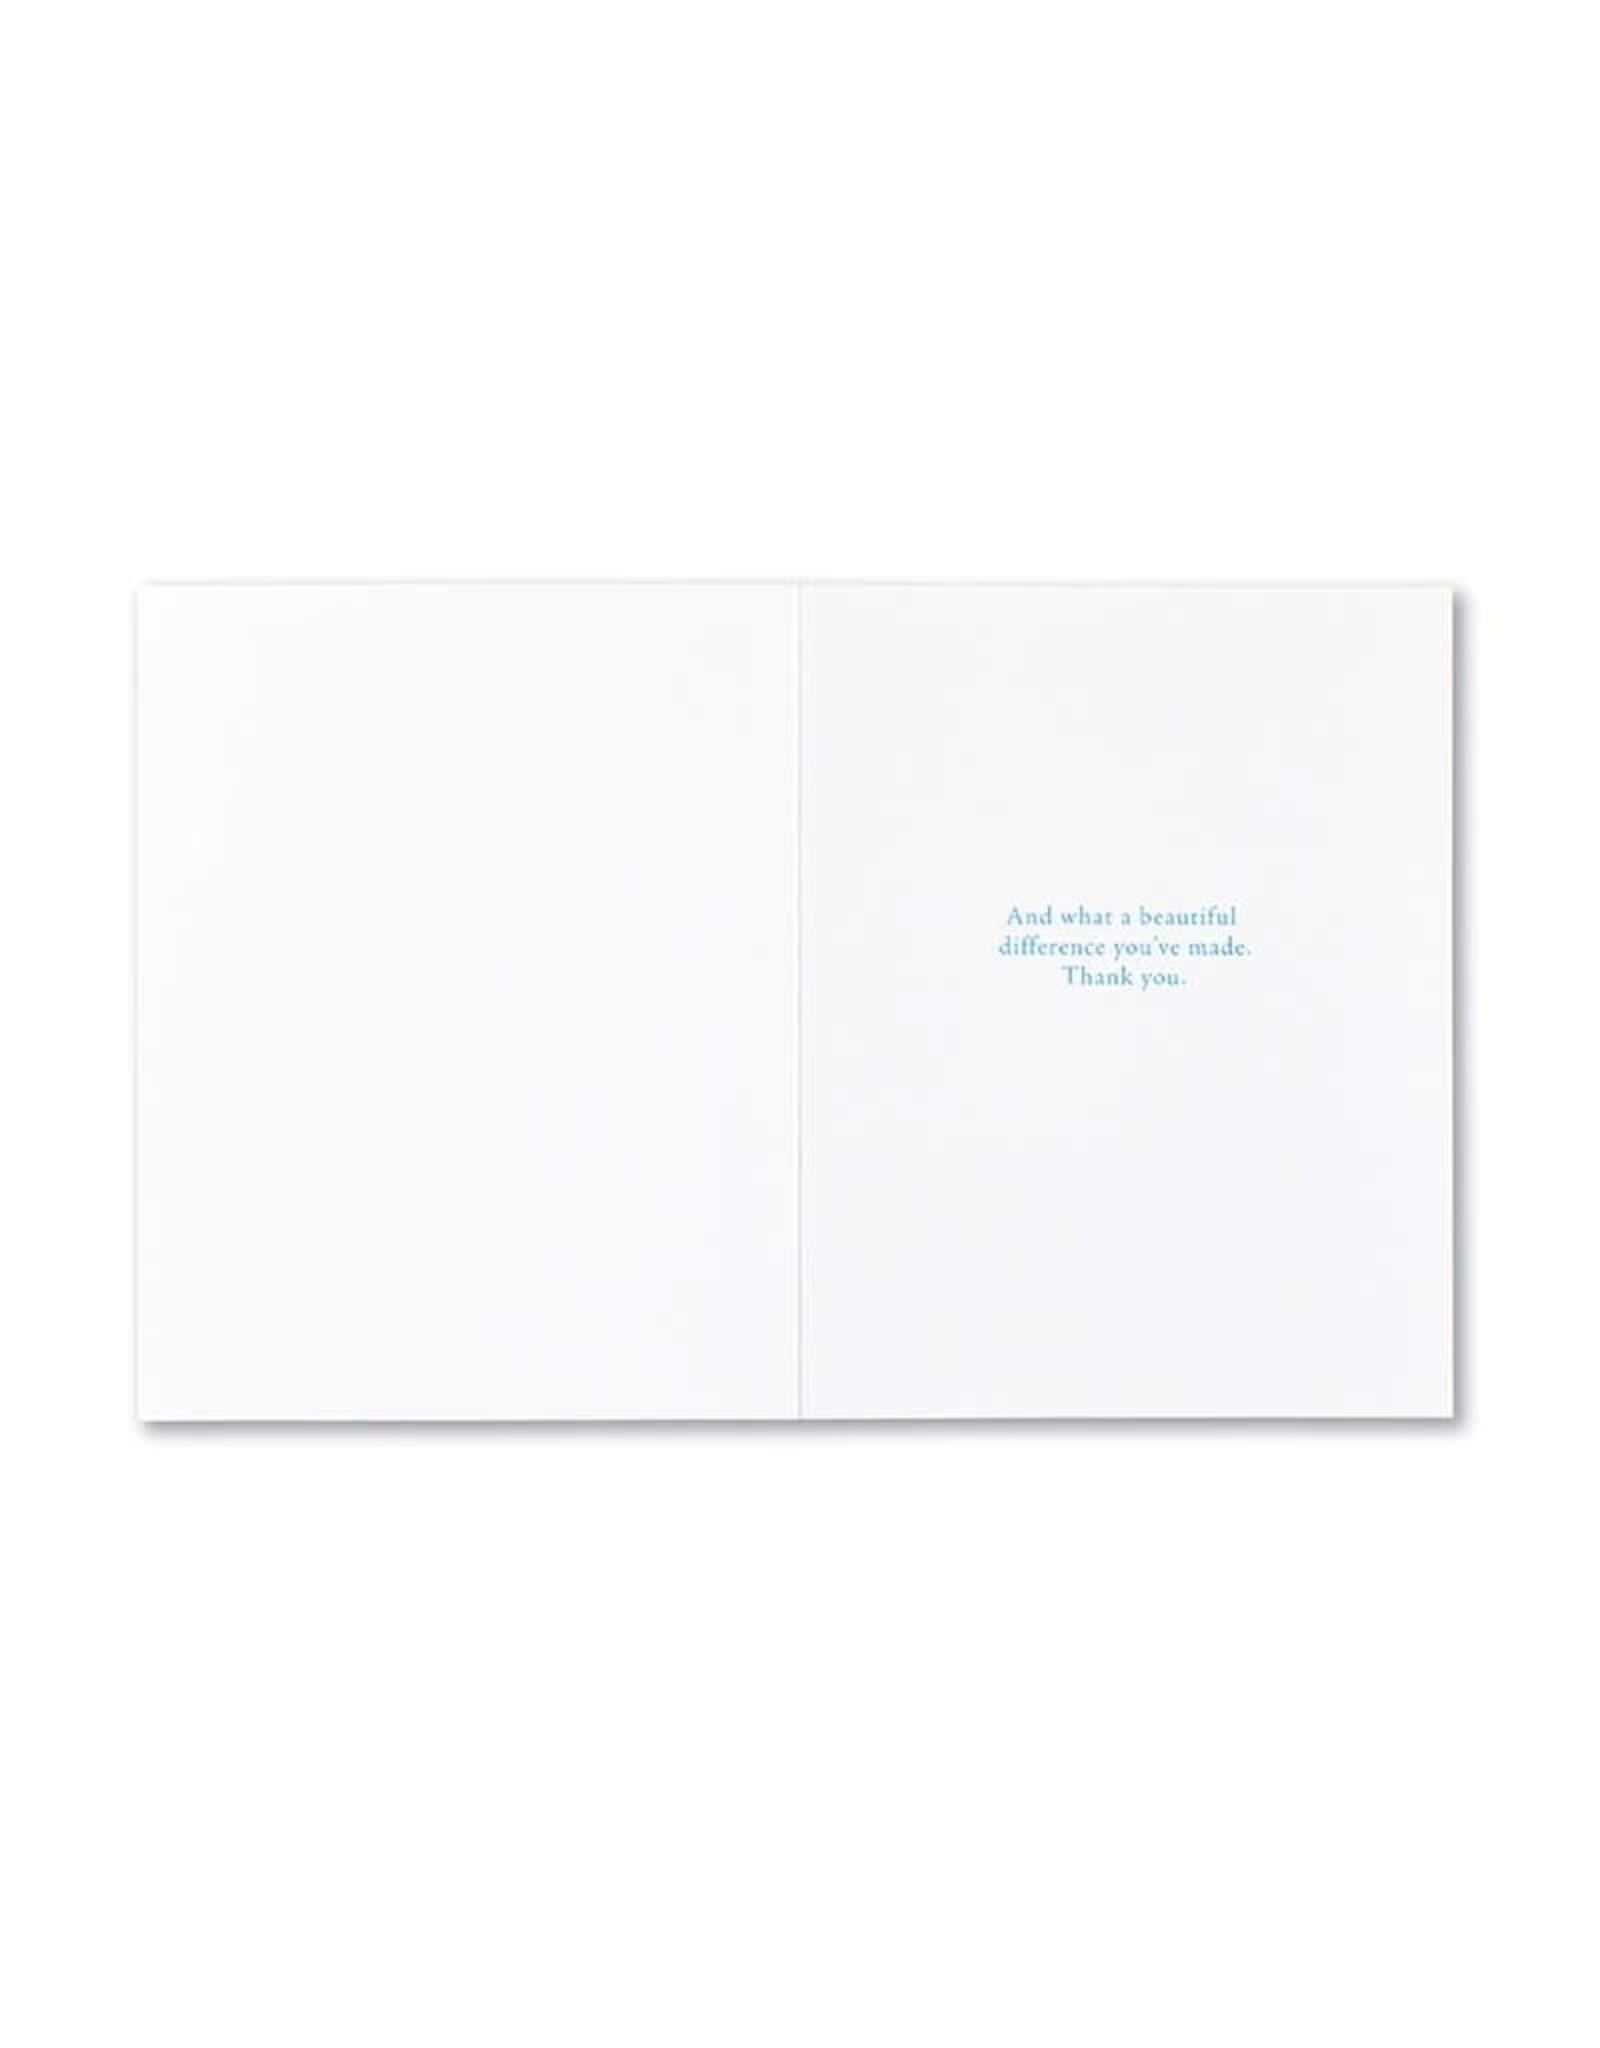 Positively Green PG Card Appreciation